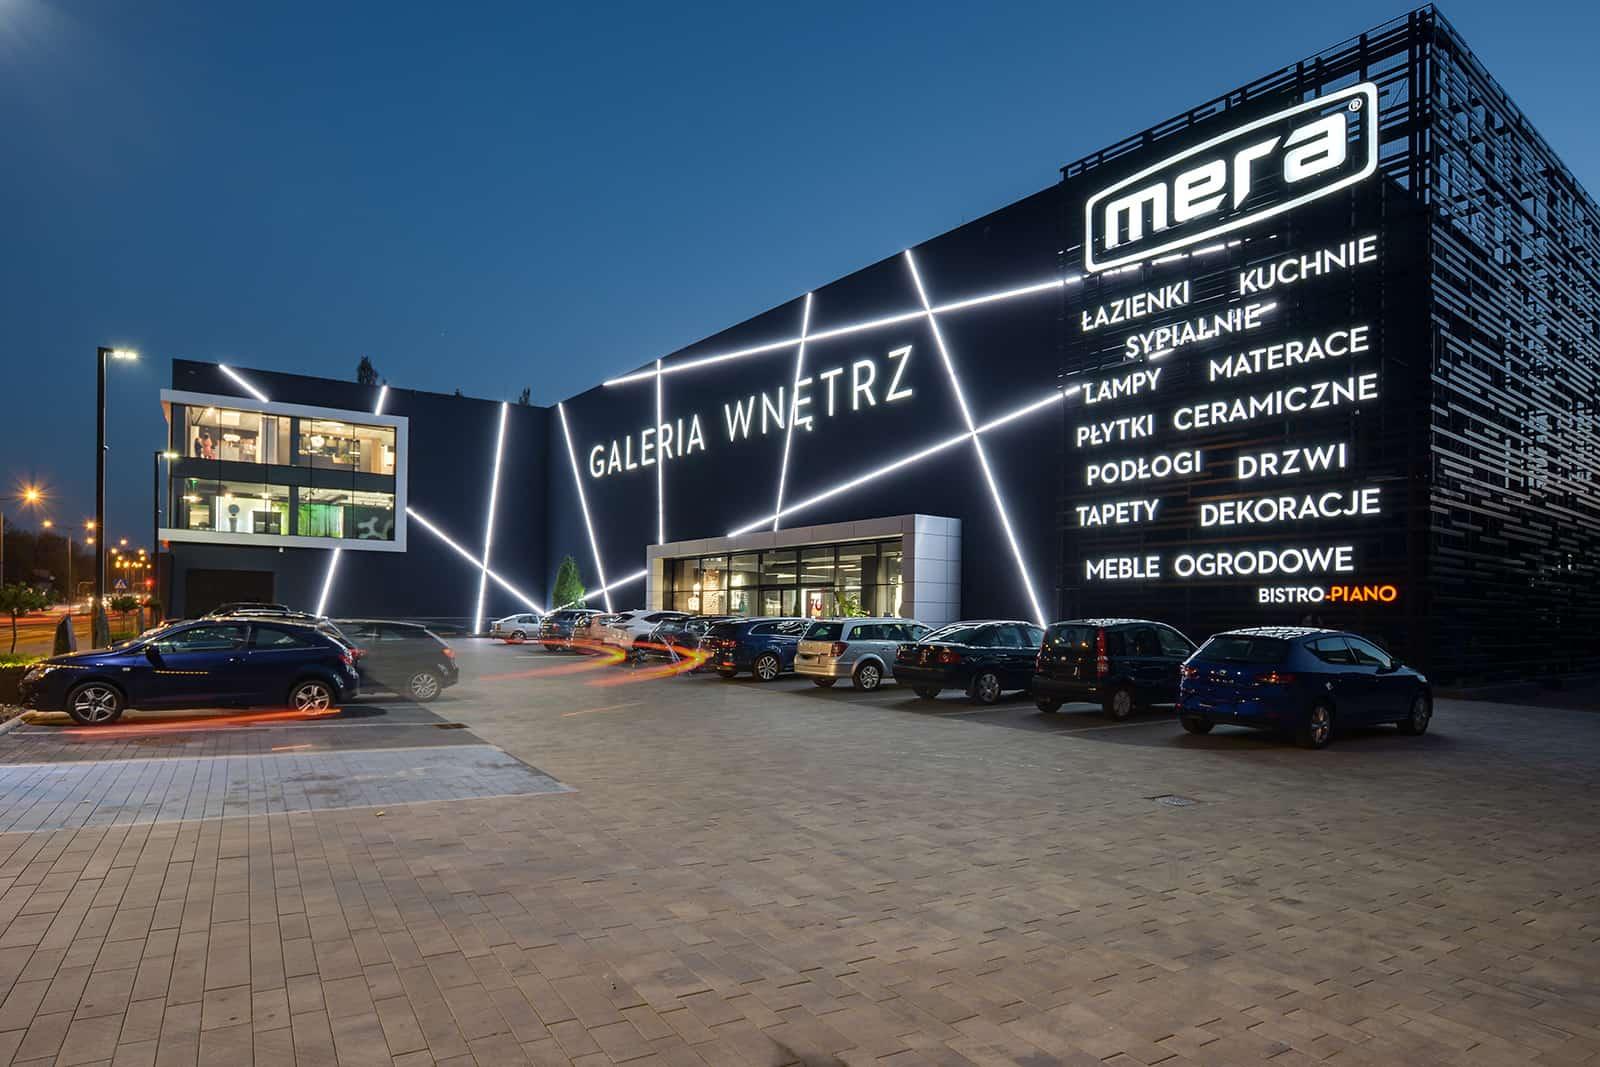 Meble ogrodowe Mera Bielsko-Biała